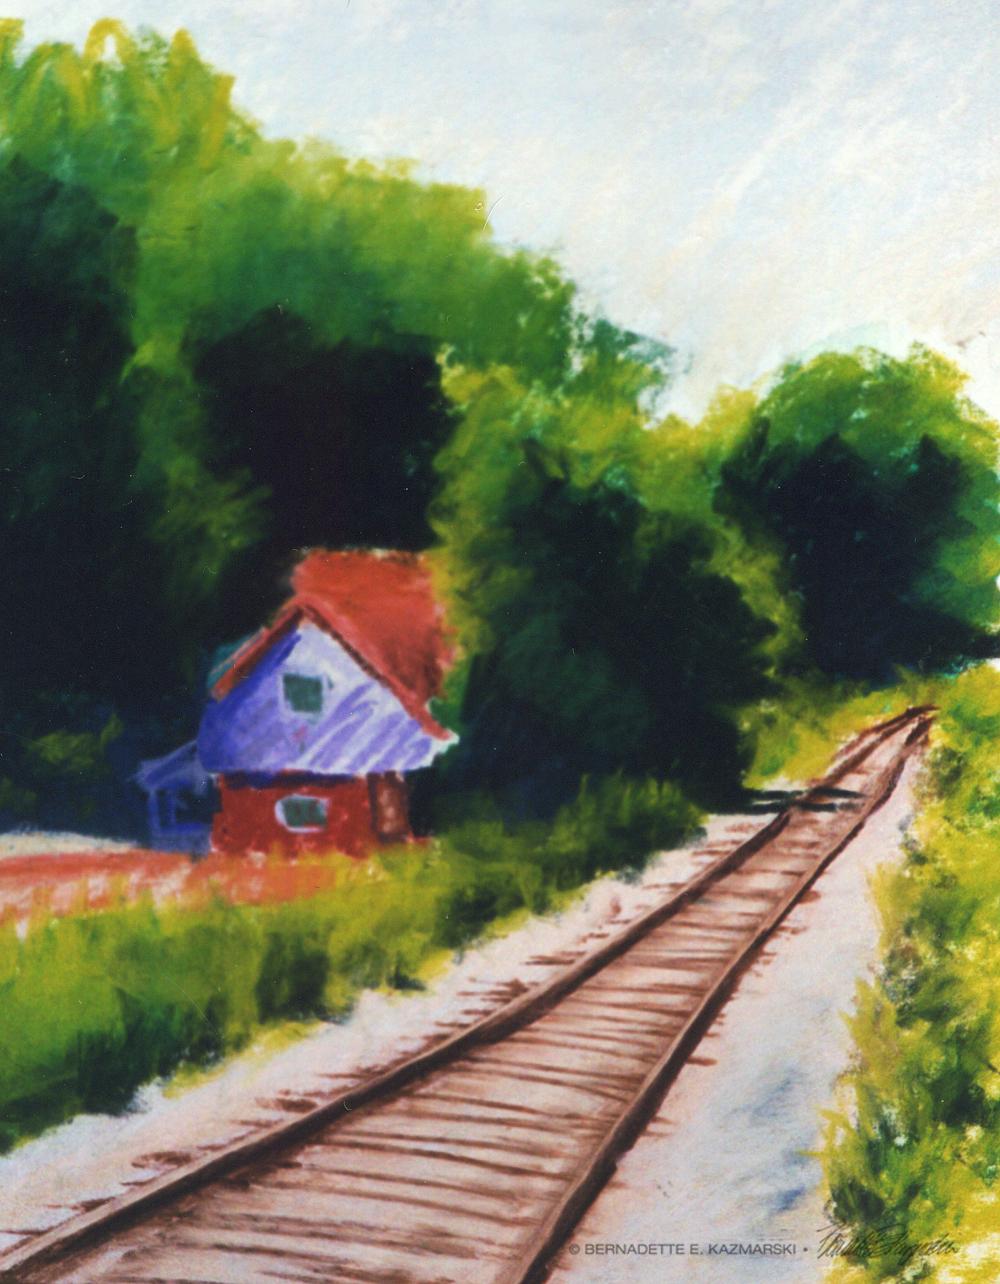 House By Tracks, 9 x 12, pastel © Bernadette E. Kazmarski